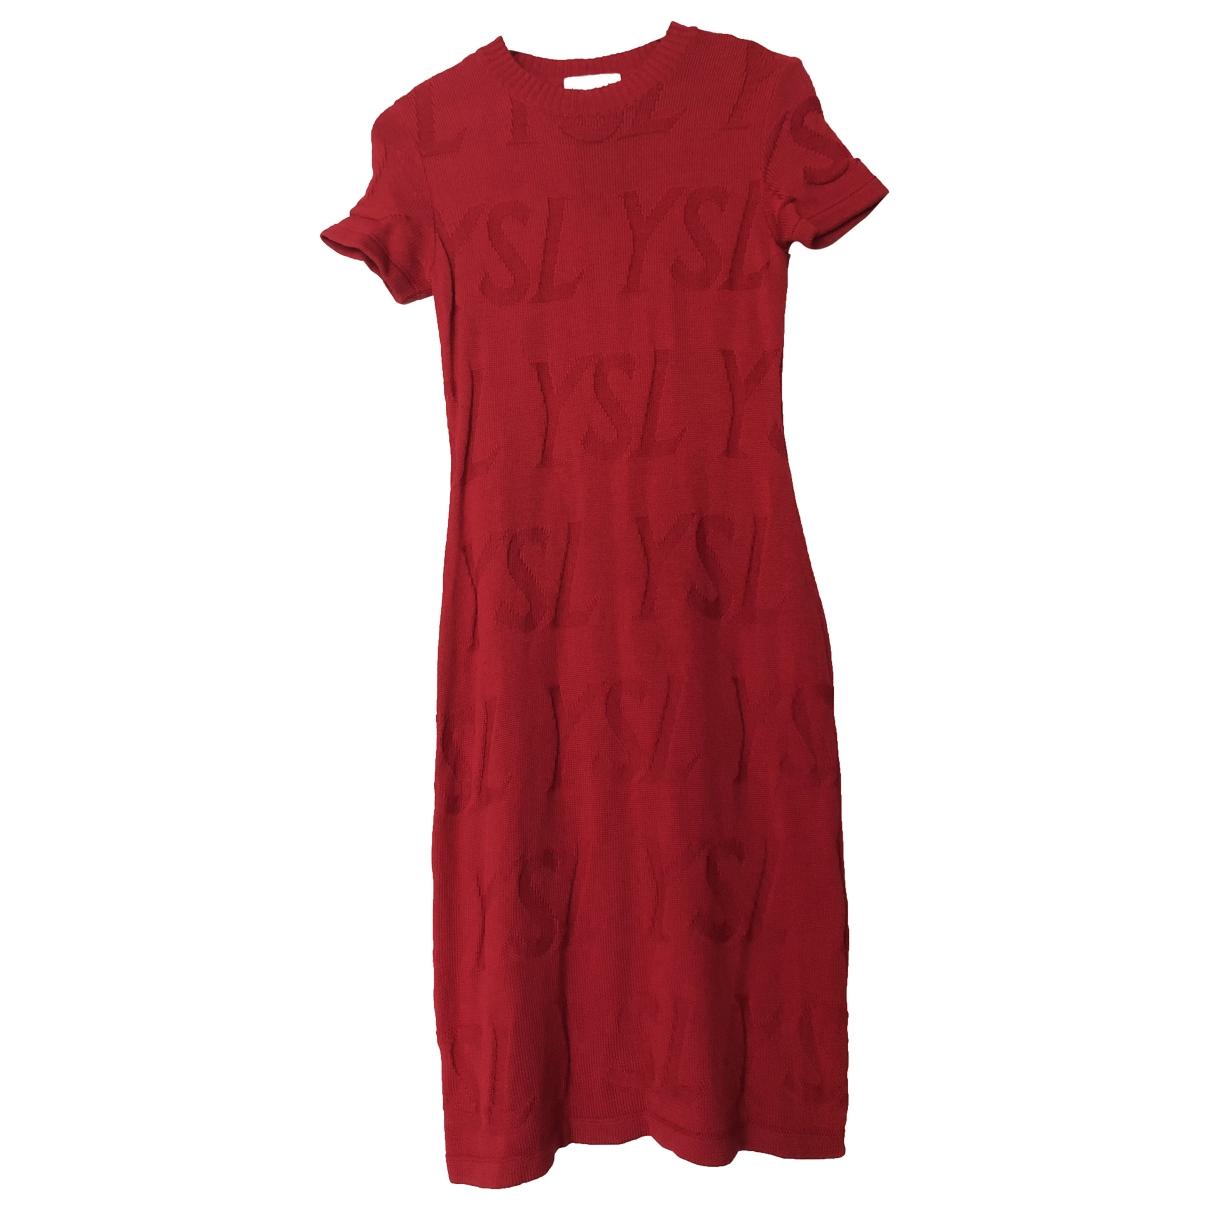 Yves Saint Laurent \N Red Wool Knitwear for Women M International